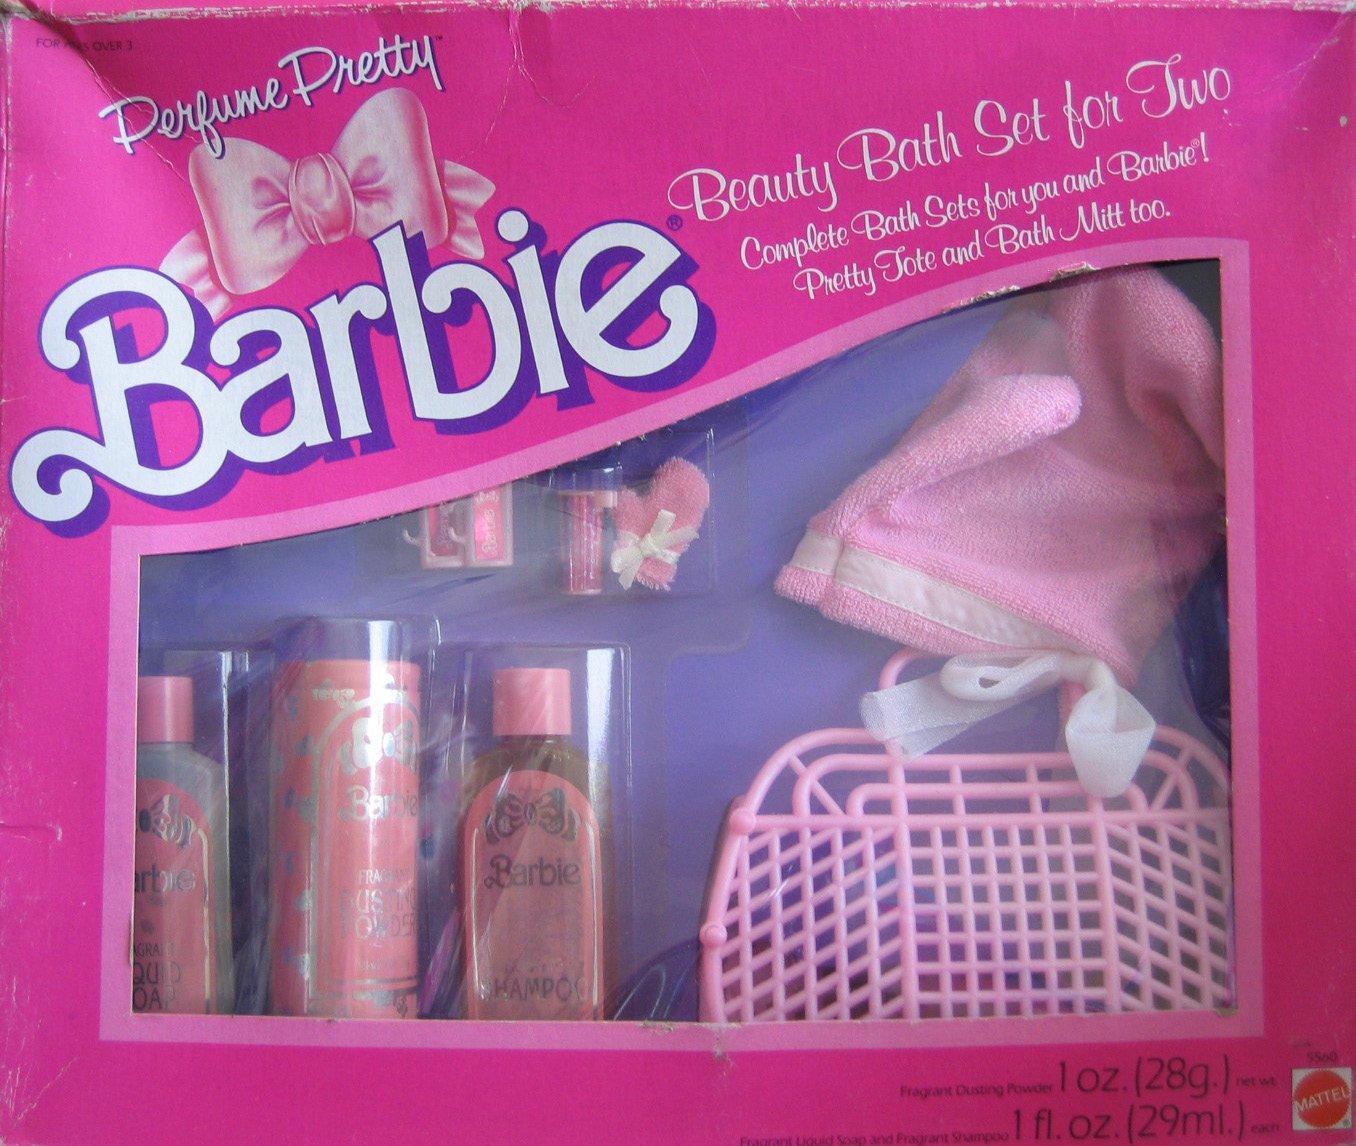 Amazon.com: Barbie Perfume Pretty Beauty Bath Set For TWO, Complete Bath  Sets For YOU U0026 Barbie! (1987 Hawthorne): Toys U0026 Games